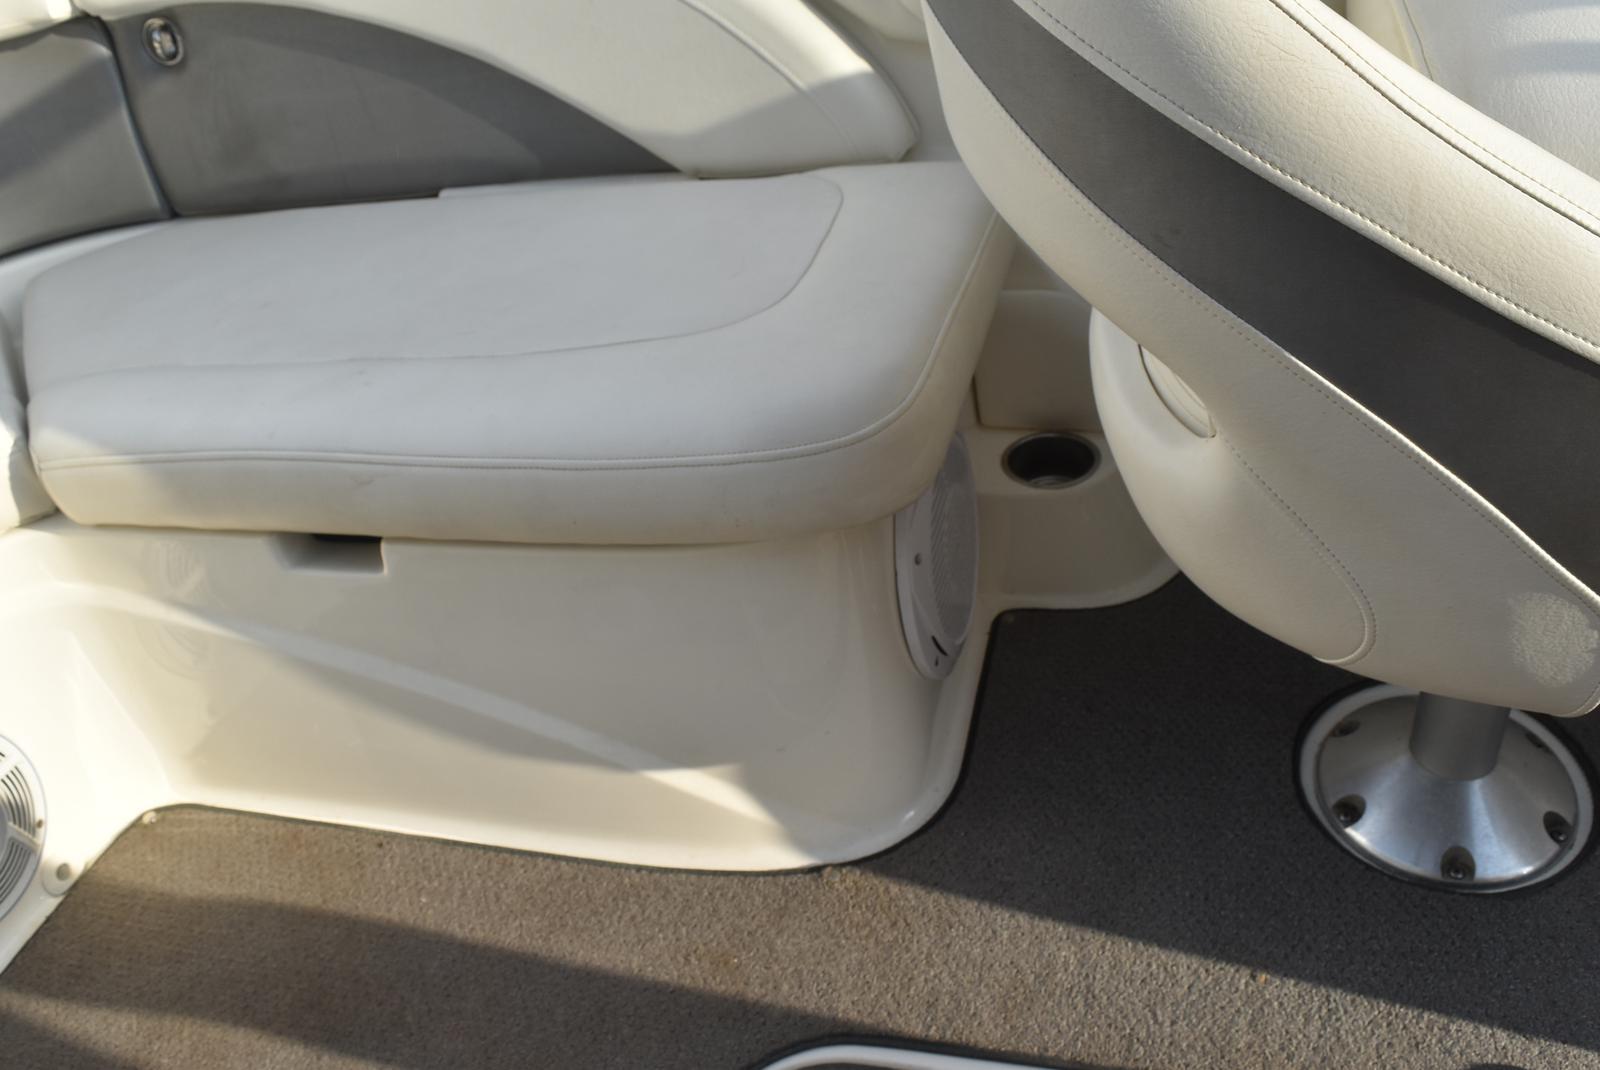 2010 Bayliner boat for sale, model of the boat is 235BR & Image # 30 of 43